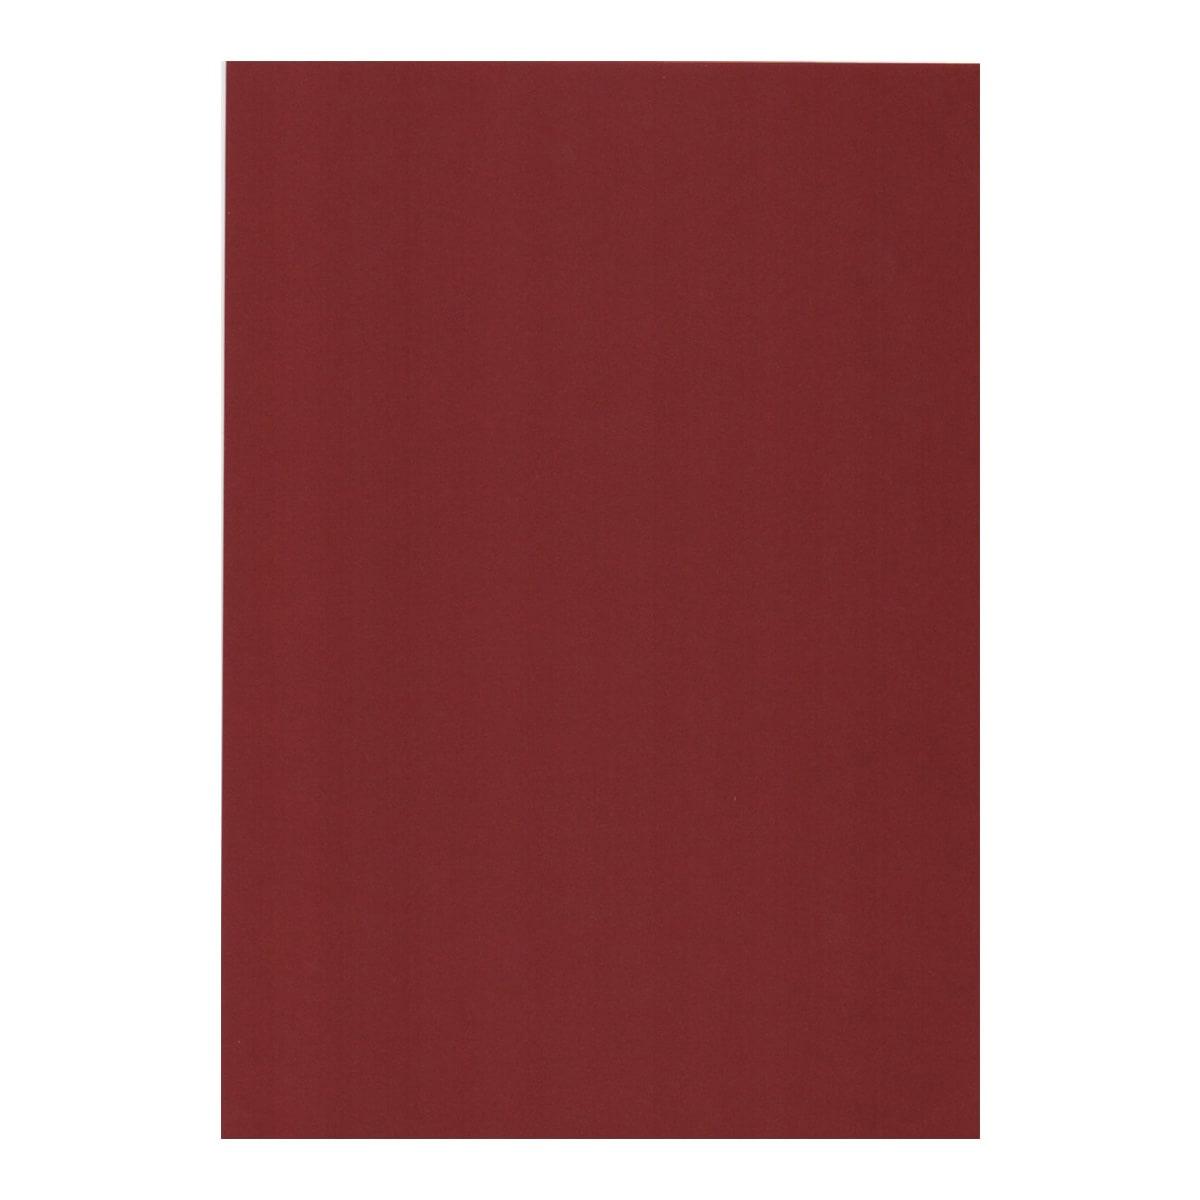 A3 CURIOUS METALLICS RED LACQUER IRIDESCENT CARD (300gsm)